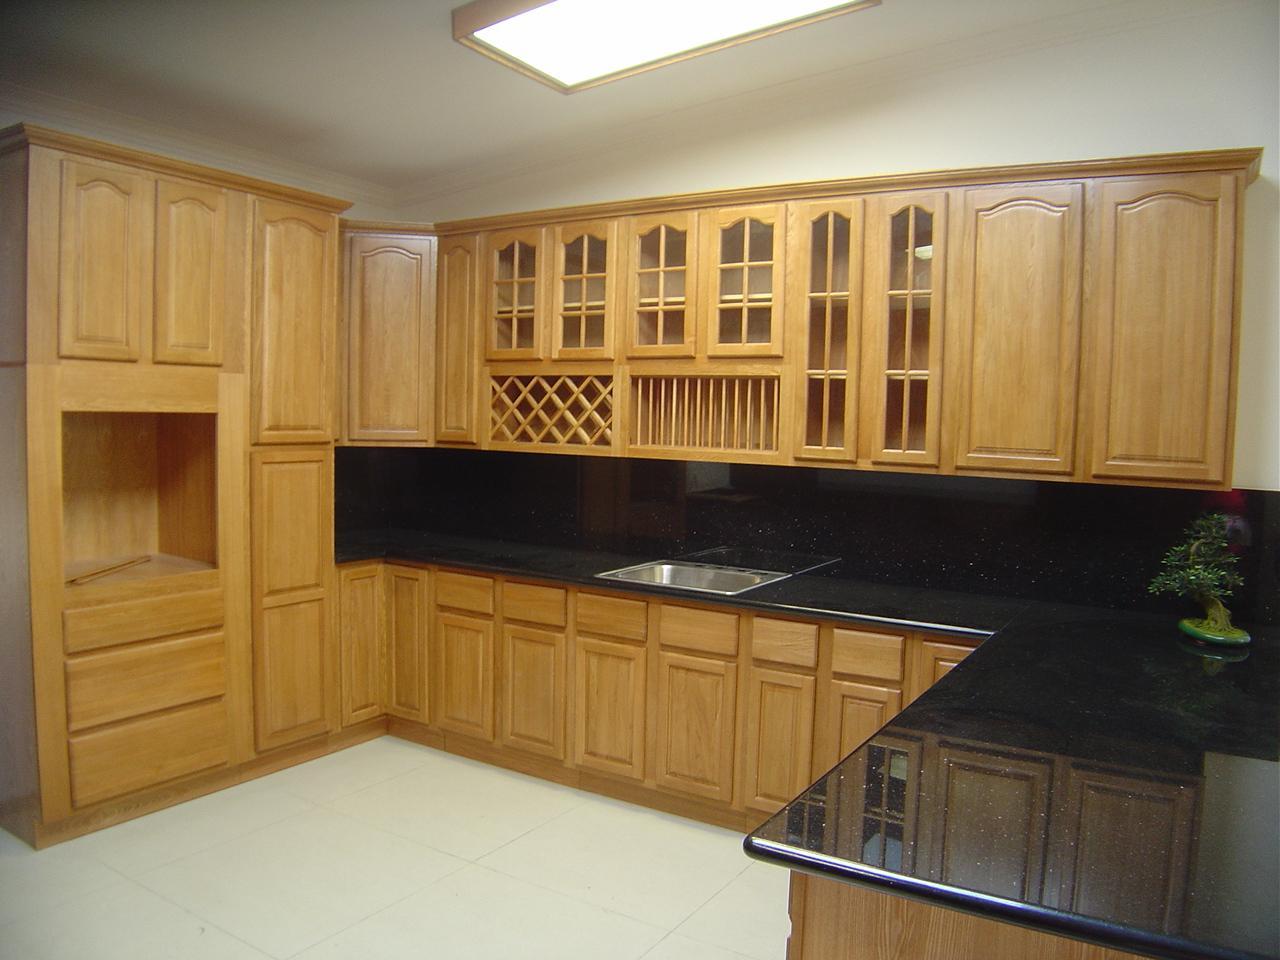 Home depot kitchen pantry photo - 1